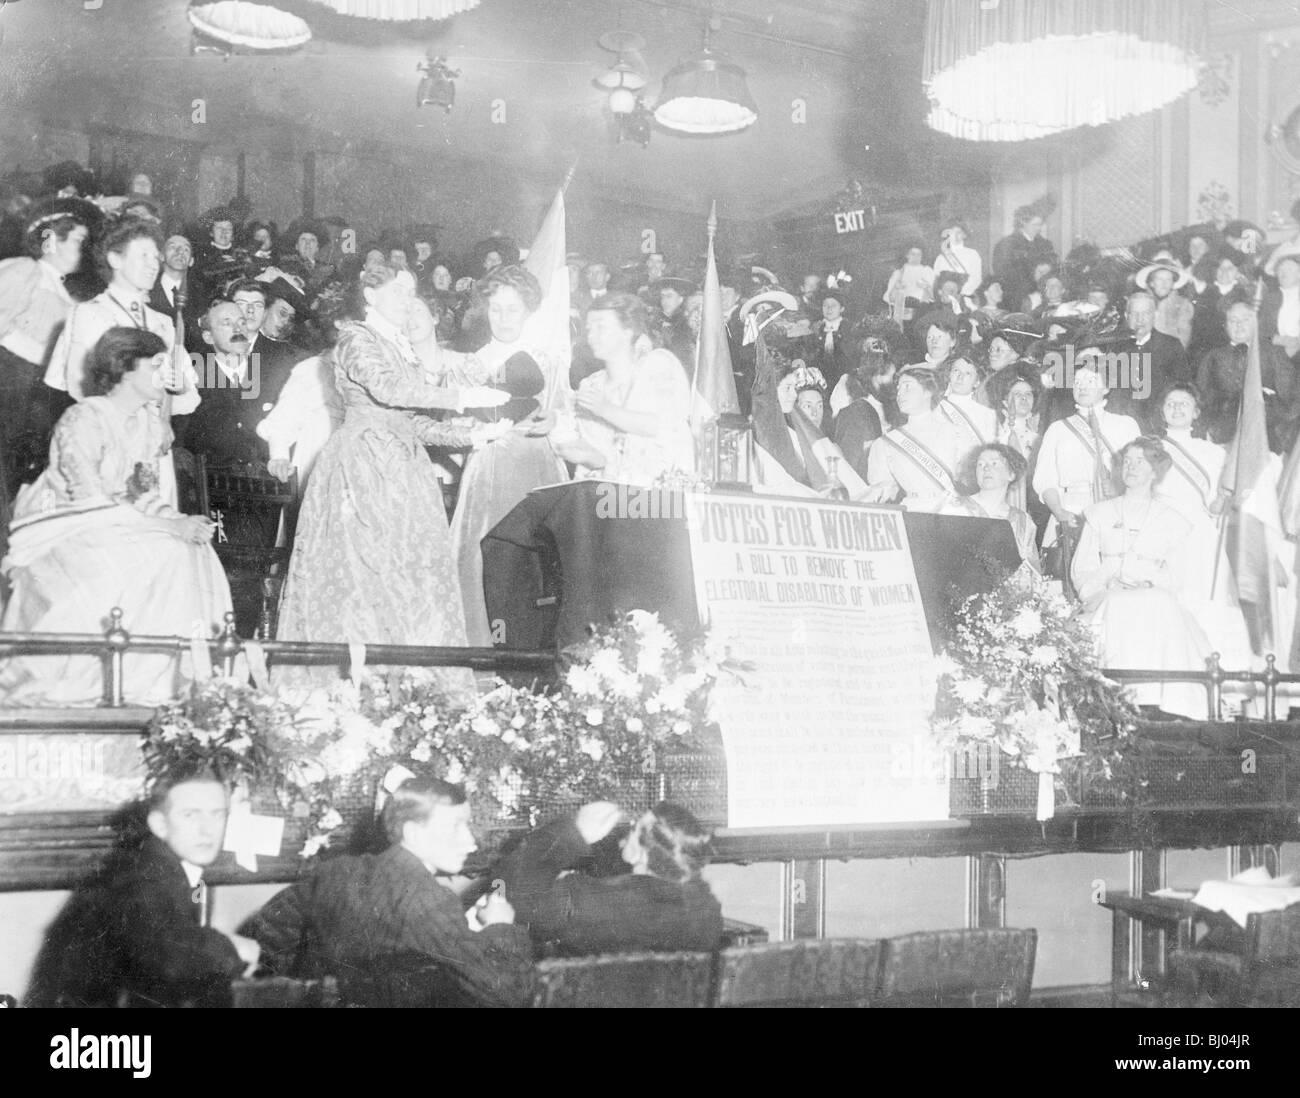 Emmeline Pankhurst, Langham Place, Londres, 14 janvier 1909. Artiste: Inconnu Banque D'Images